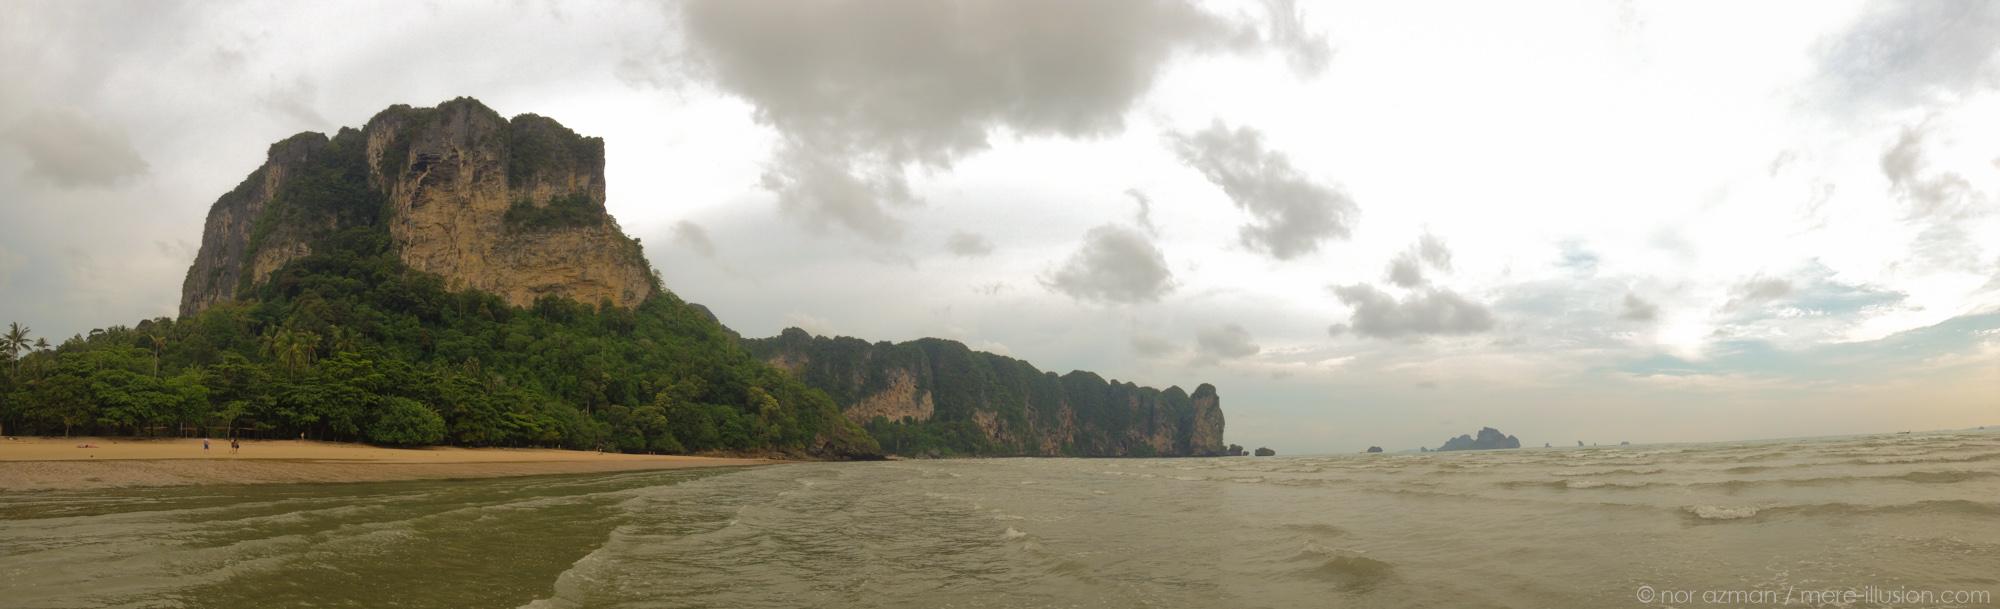 krabi snapshots, thailand by nor azman